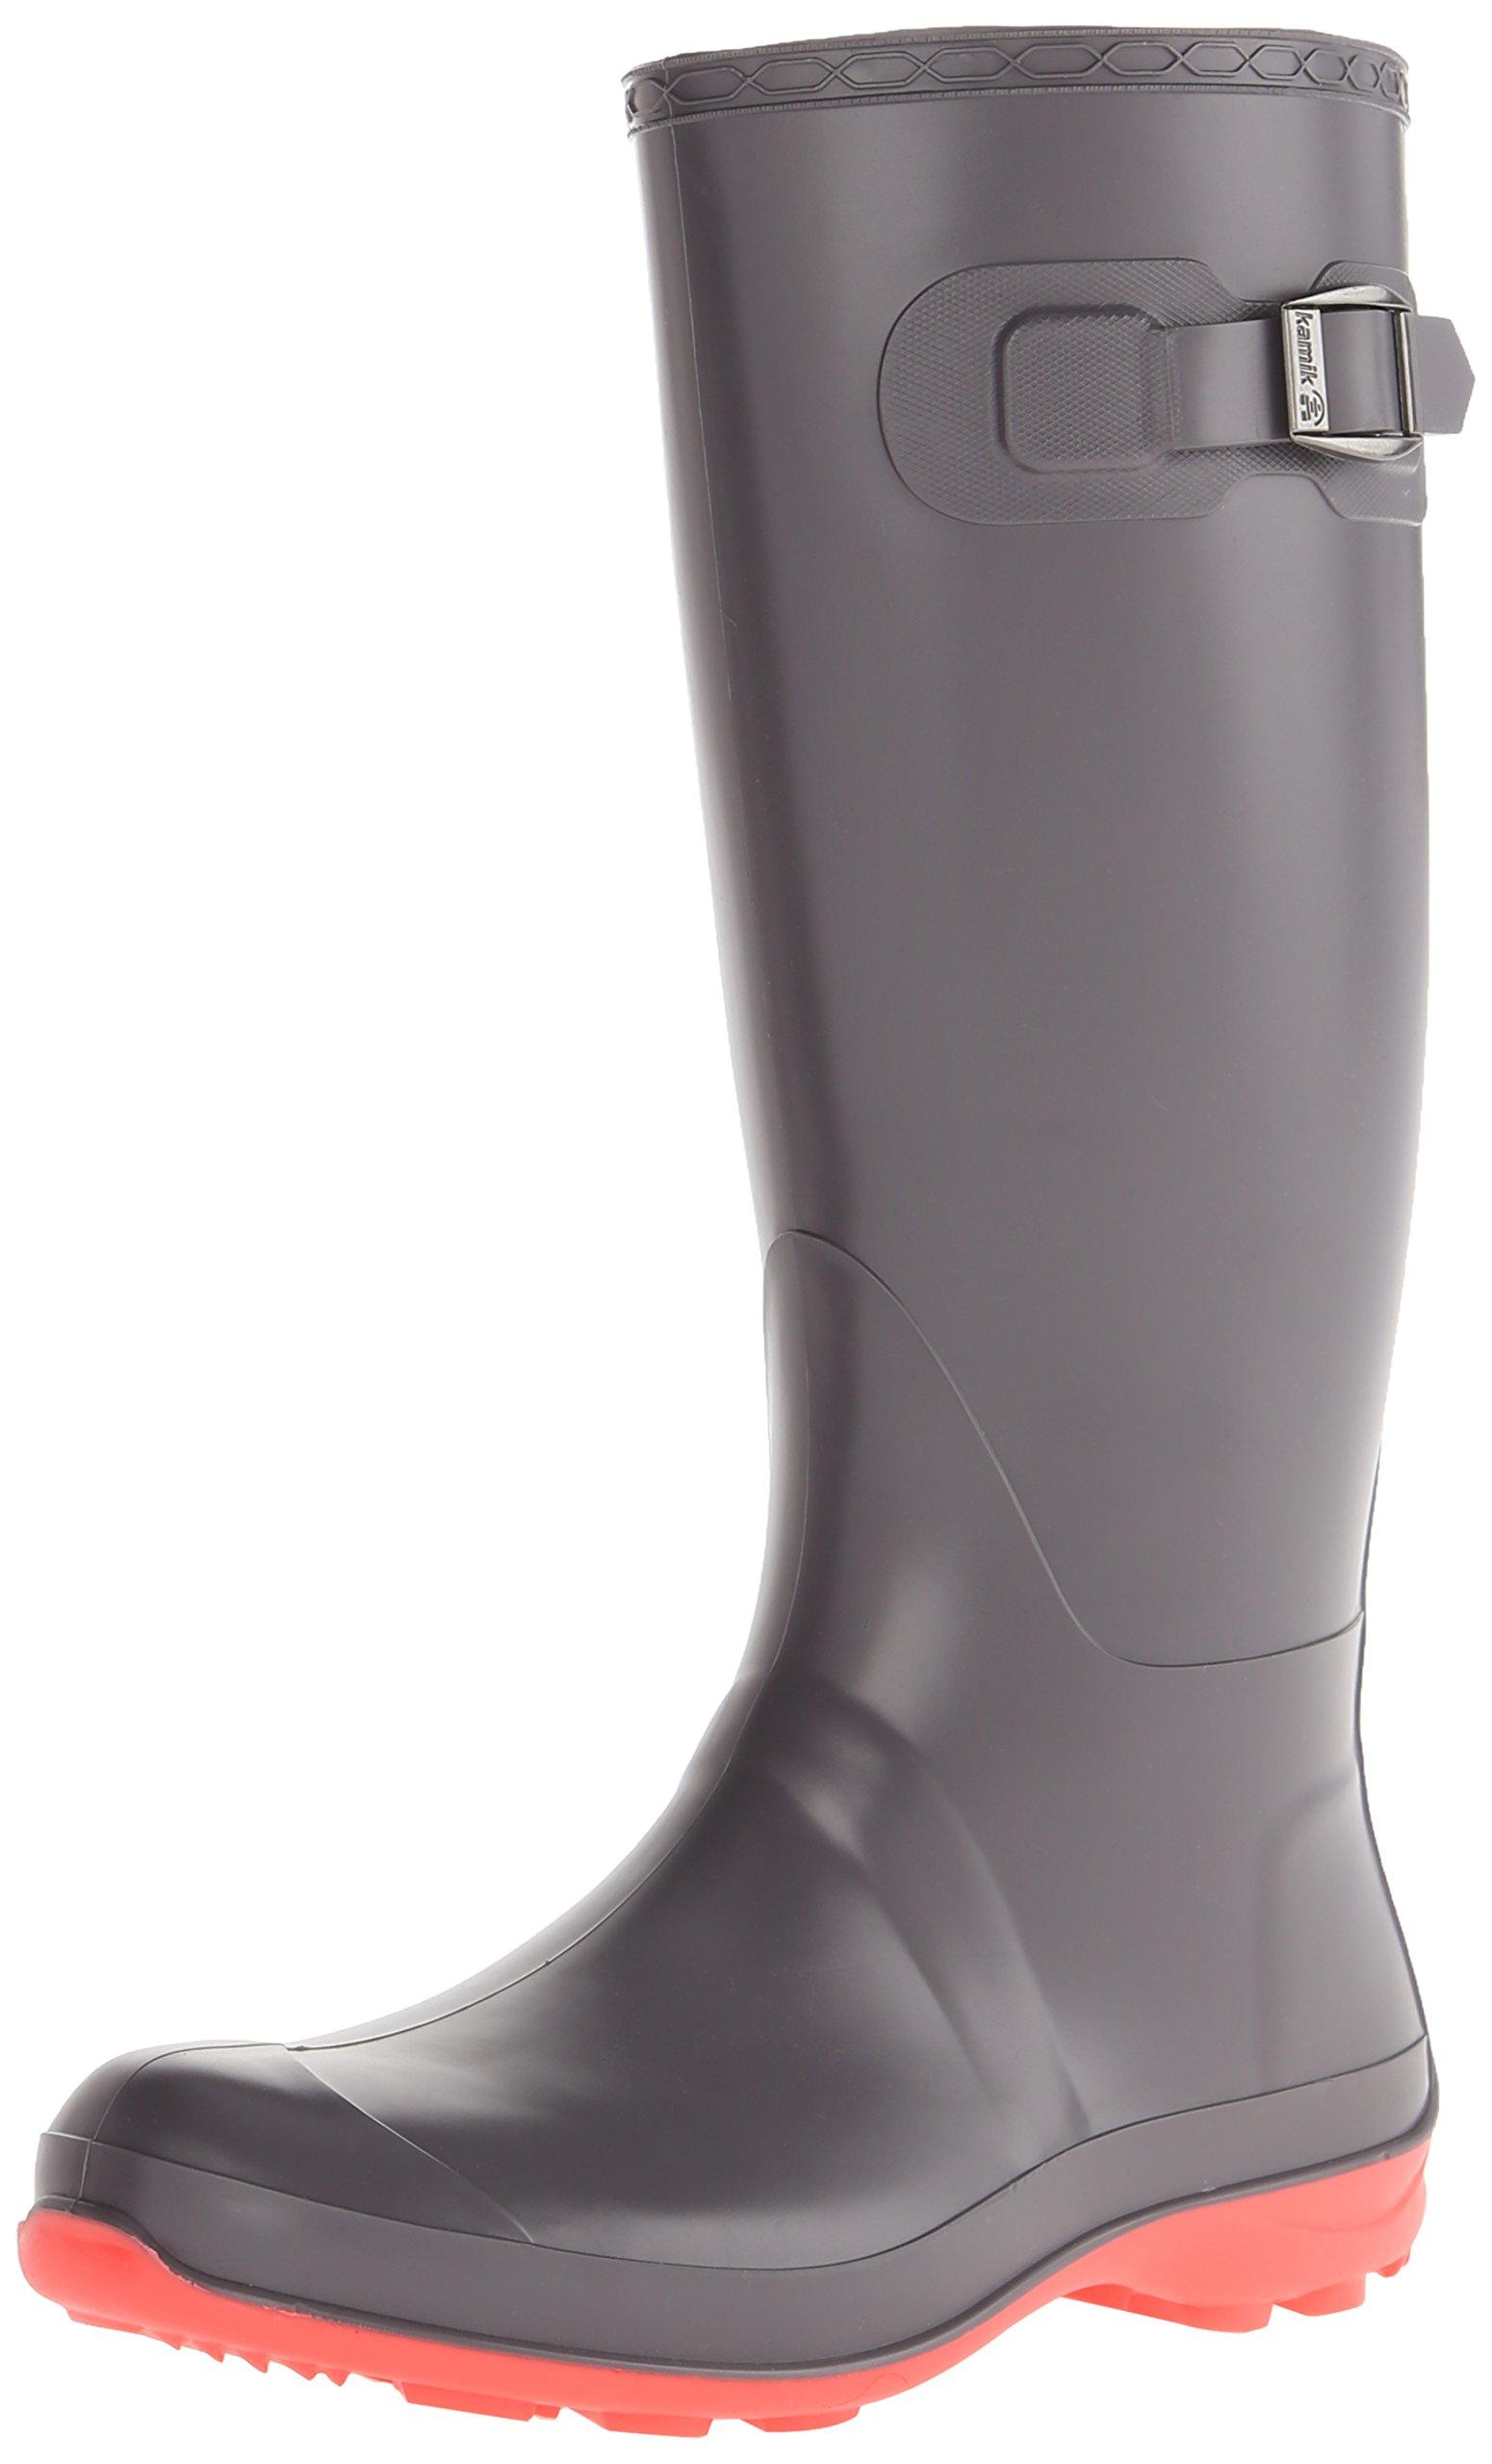 Kamik Women's Olivia Rain Boot, Charcoal W PINK BOTTOM, 9 M US by Kamik